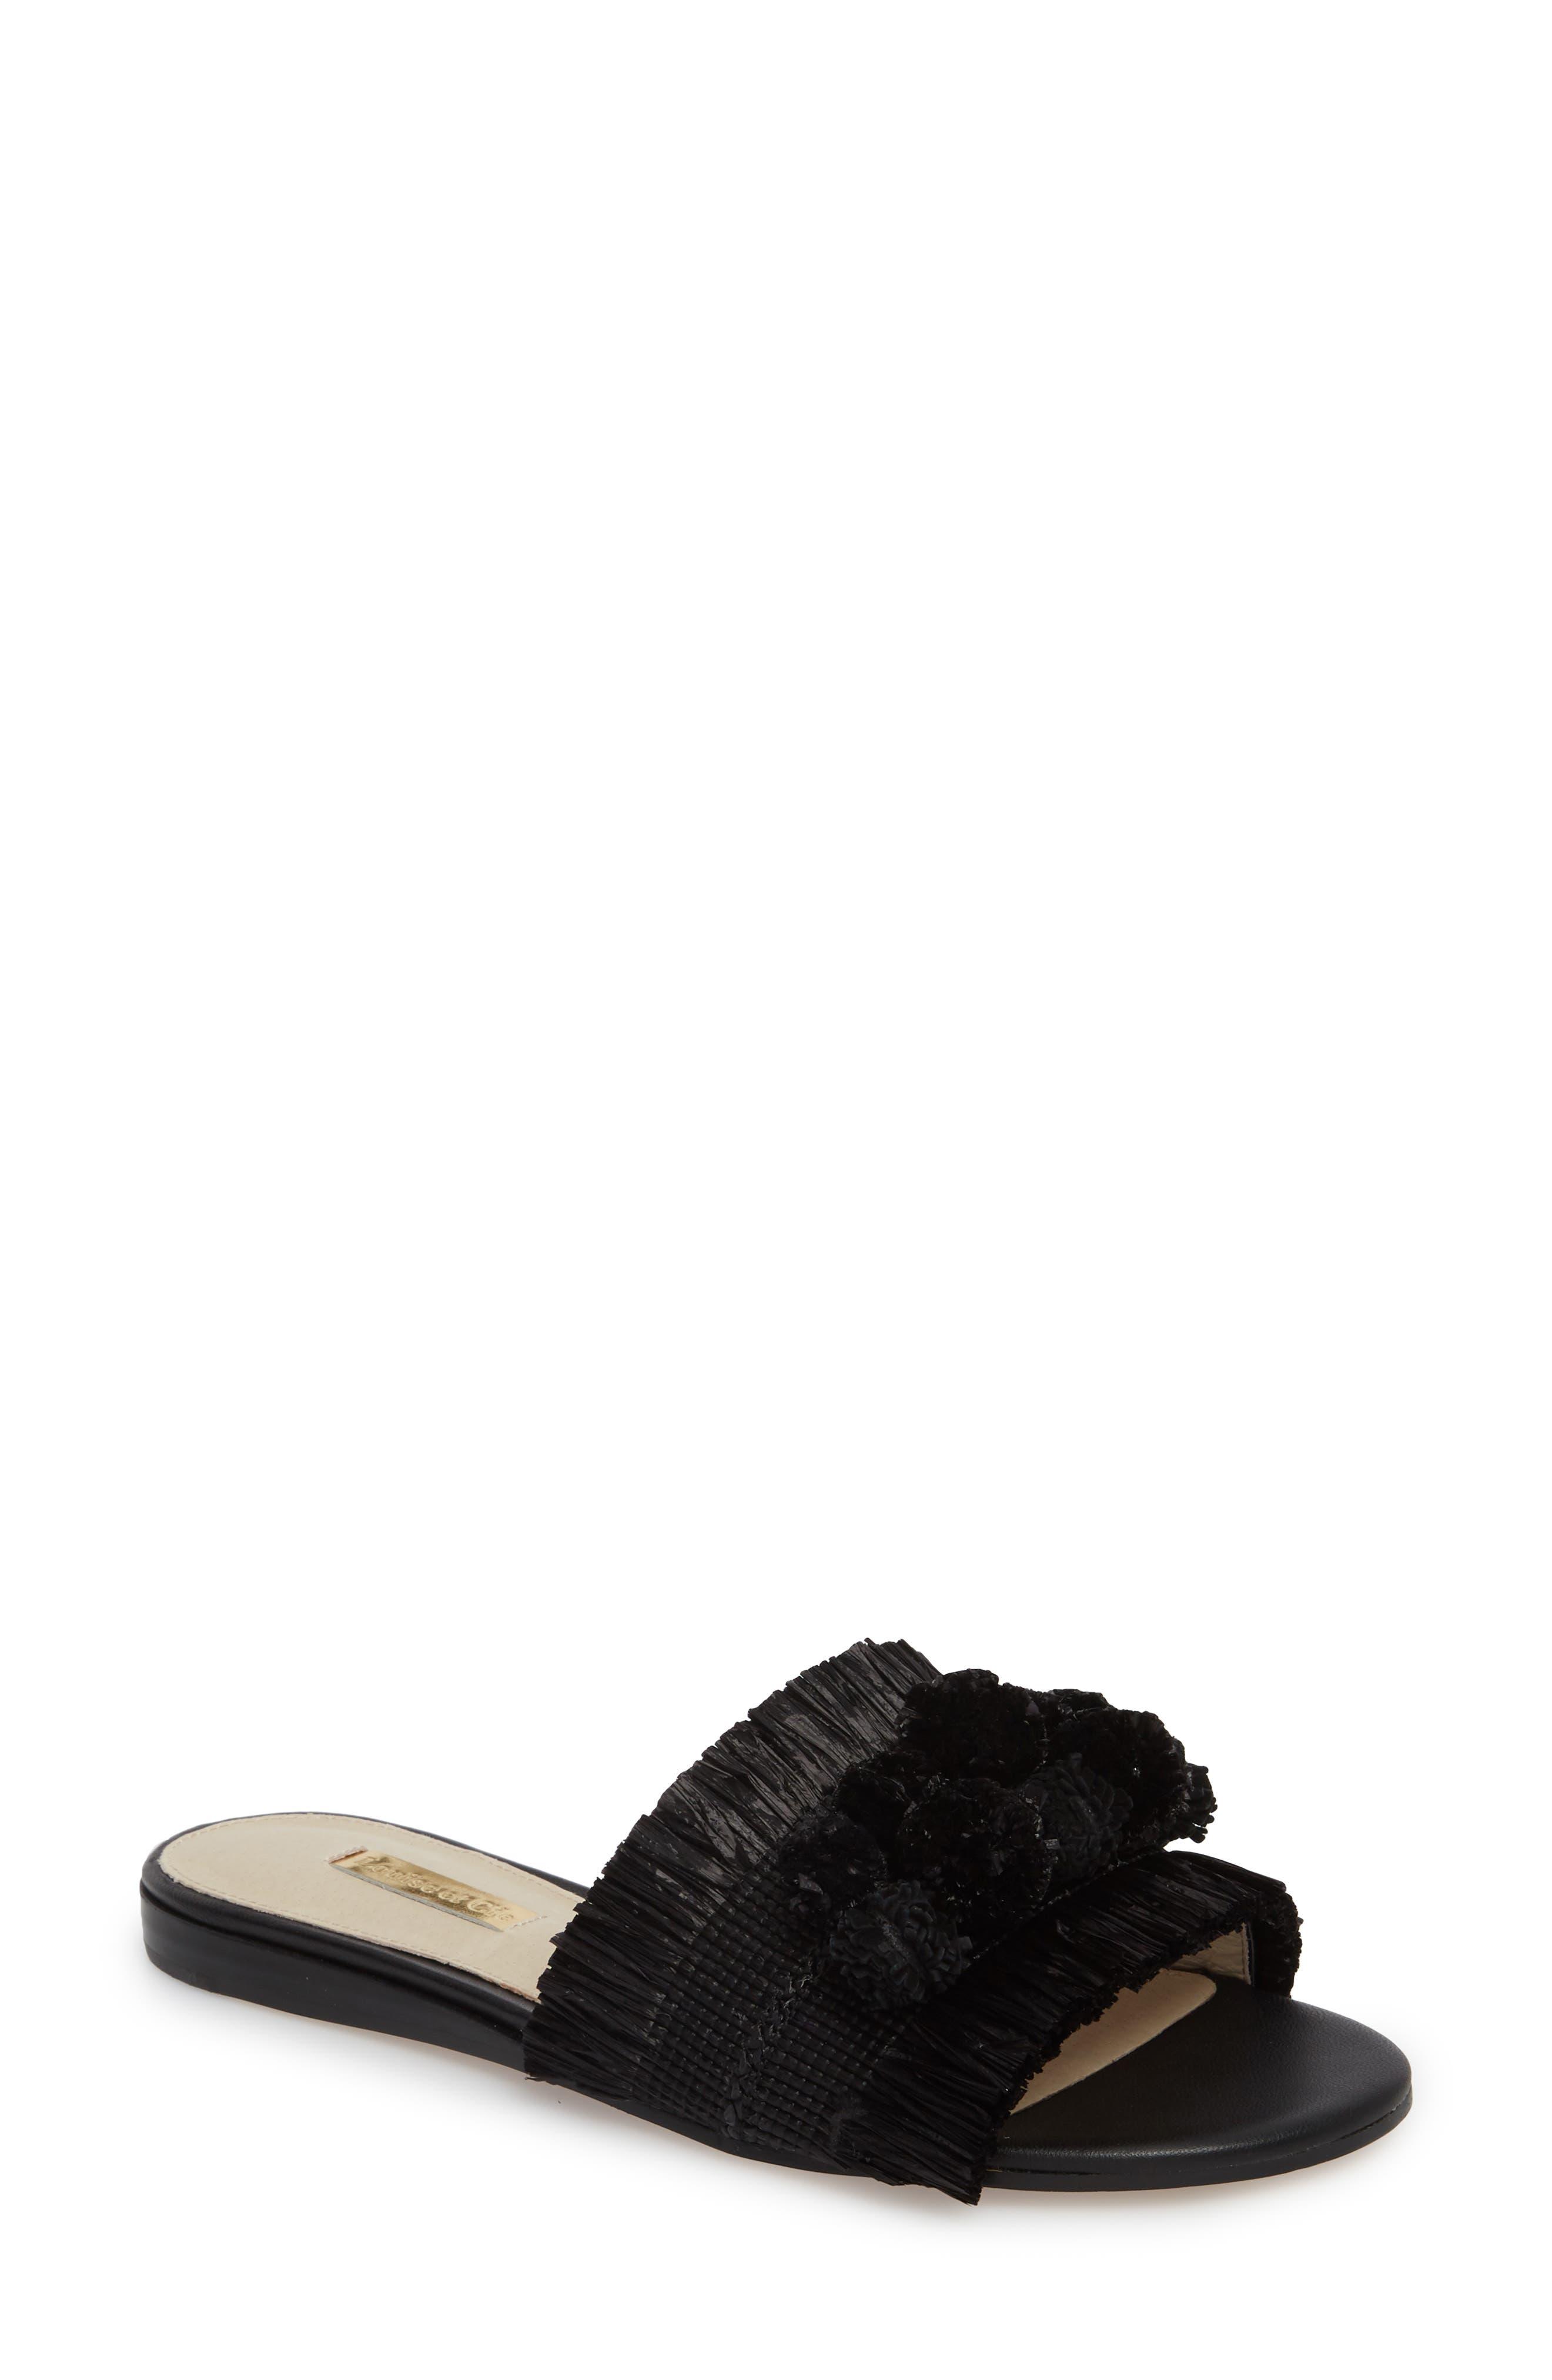 Louise Et Cie Arytha Raffia Slide Sandal, Black